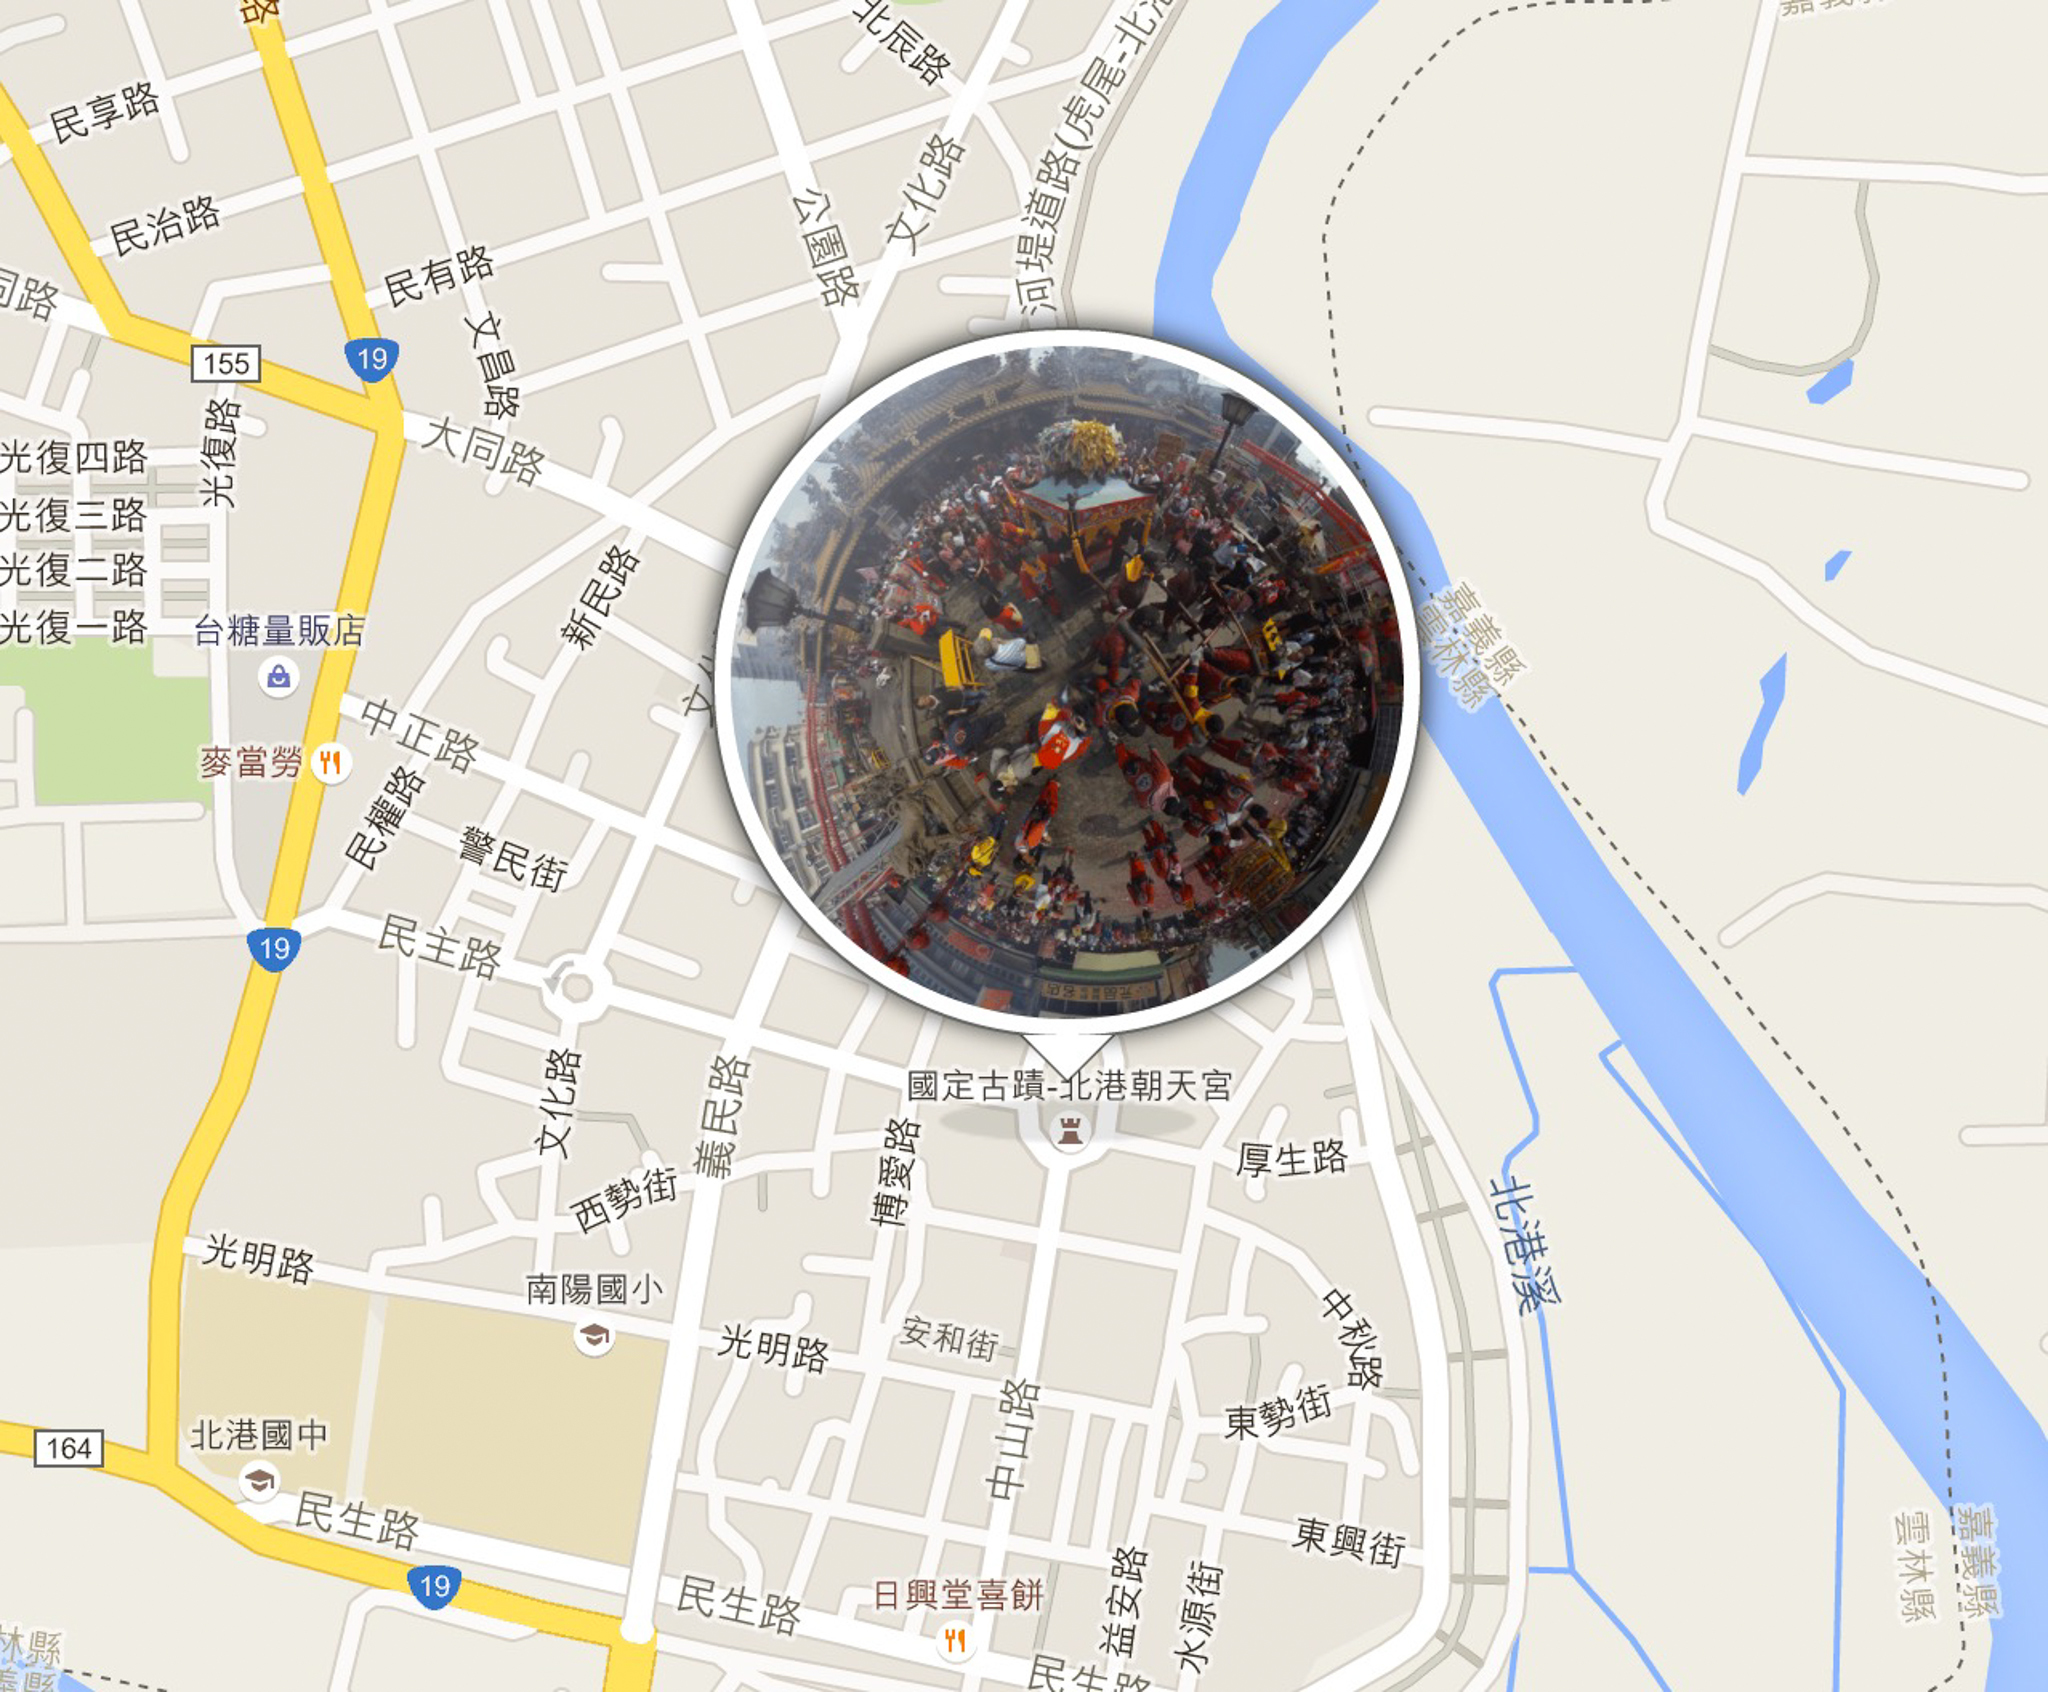 Theta S 本身有 GPS 內建定位功能,所以在上傳時候可以使用 php 去讀取 exif 的經緯度資料,並一起新增於資料庫內,前端輸出再搭配 Google Maps 即可做出此相簿地圖的功能